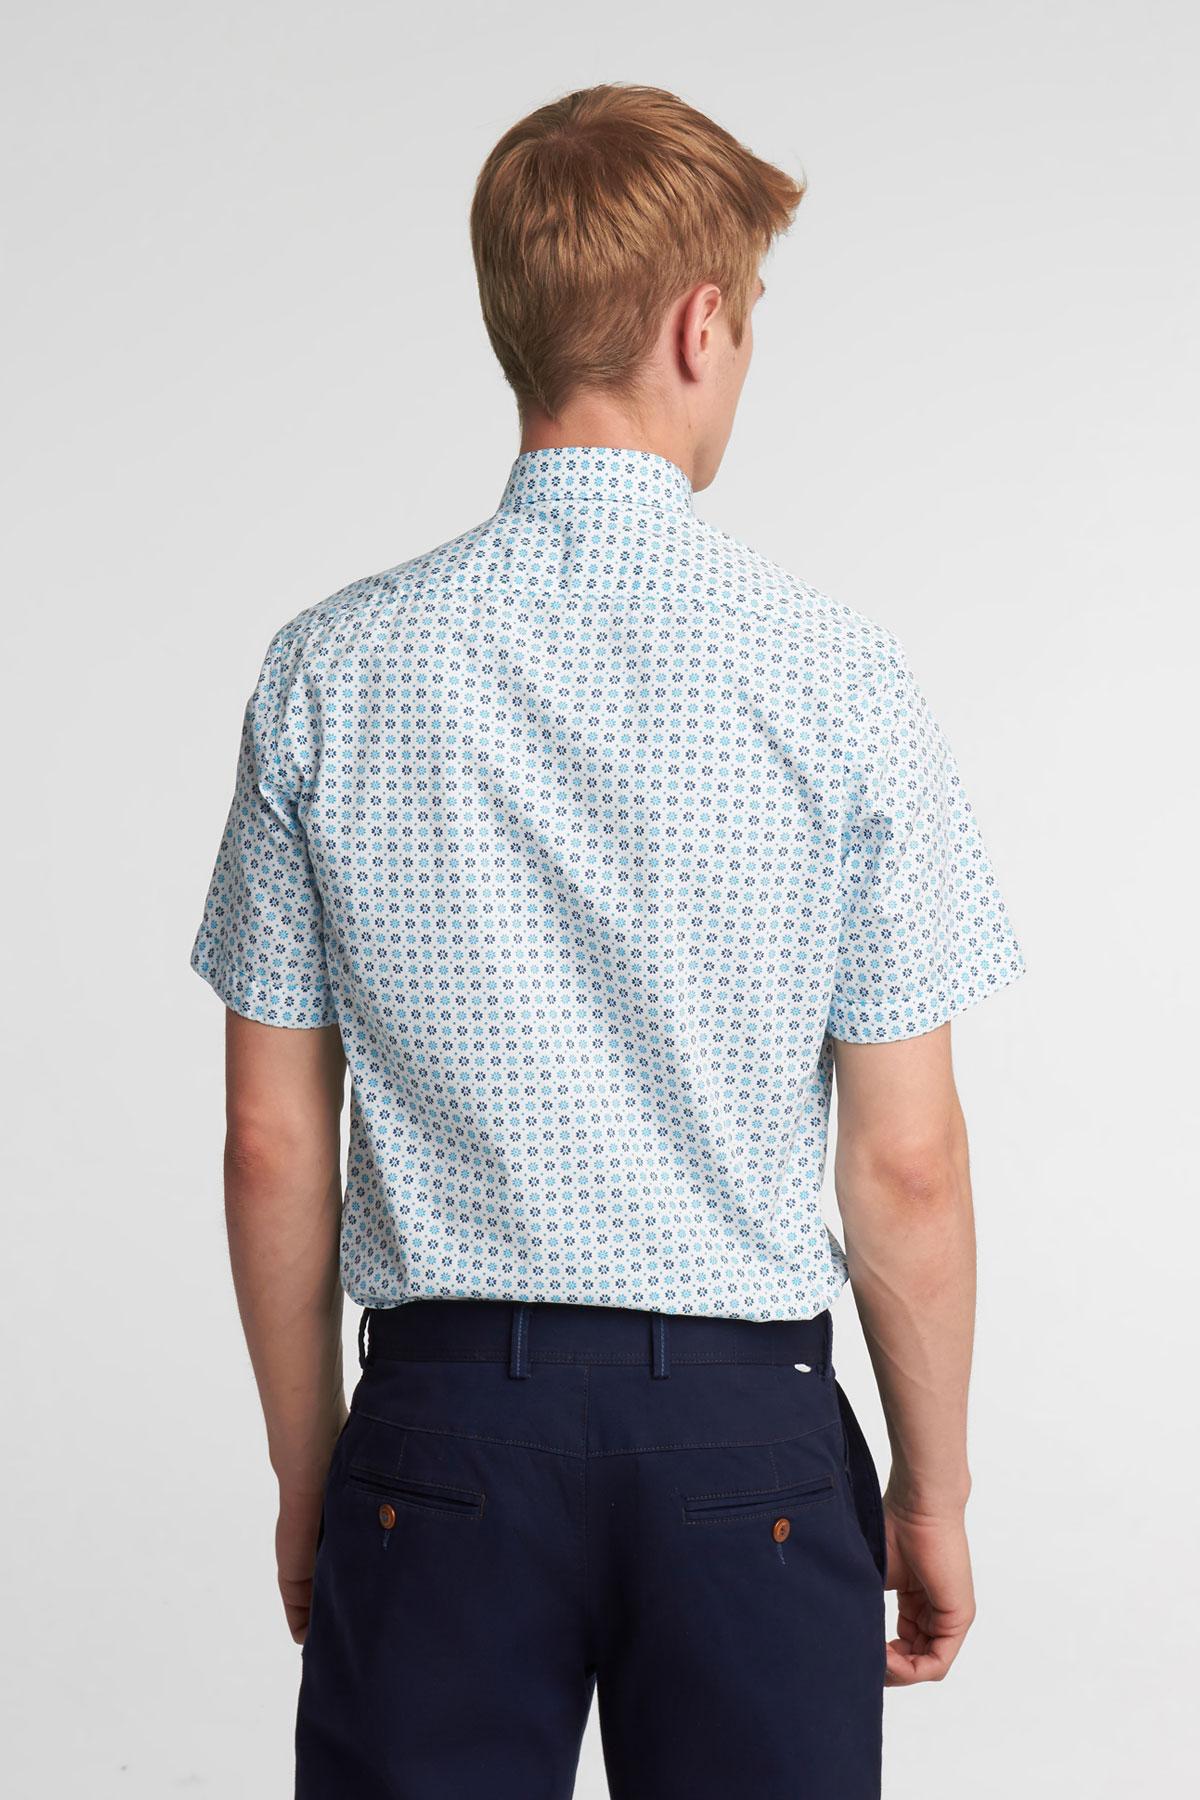 Рубашка с коротким рукавом белого цвета в узор 18142